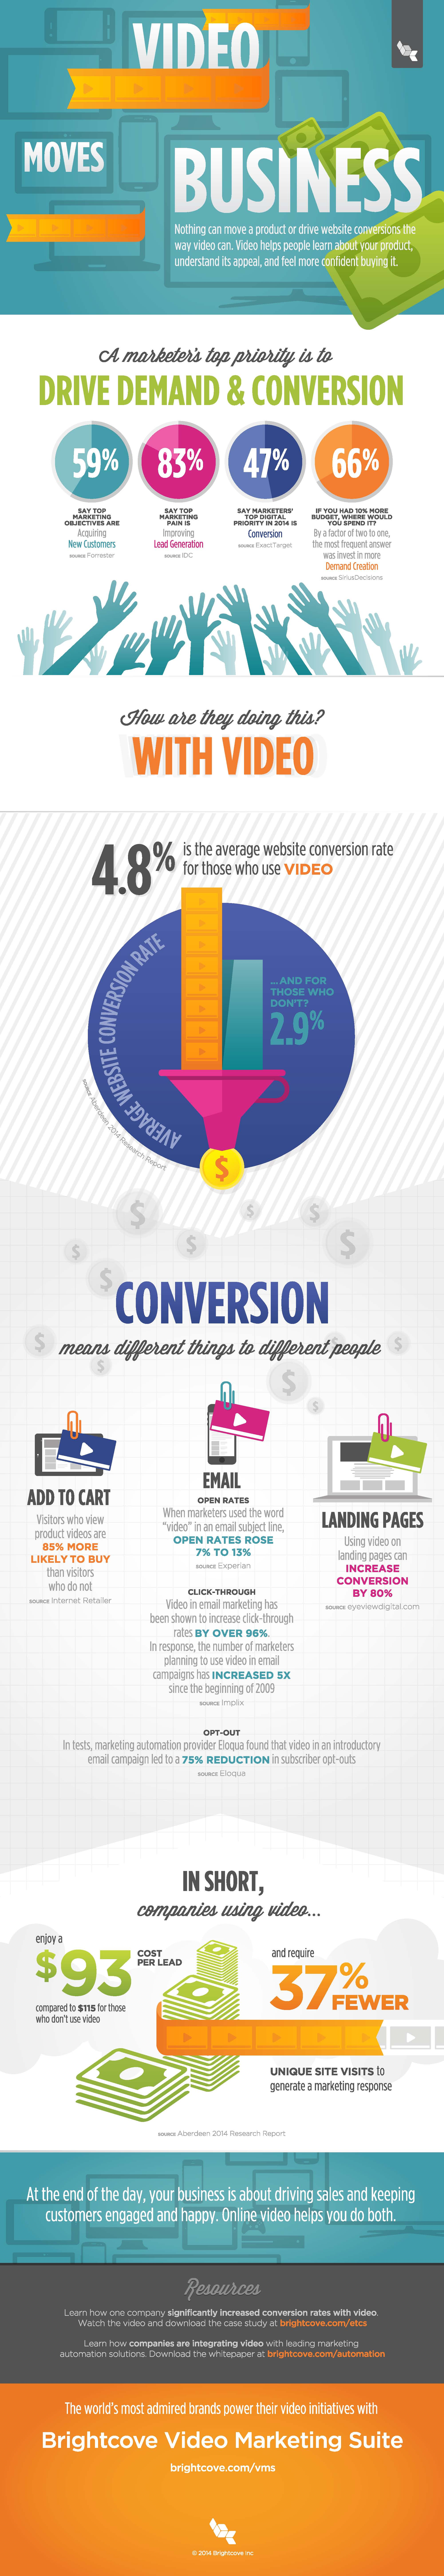 infographics-video moves business-use of mktg video-EN FINAL